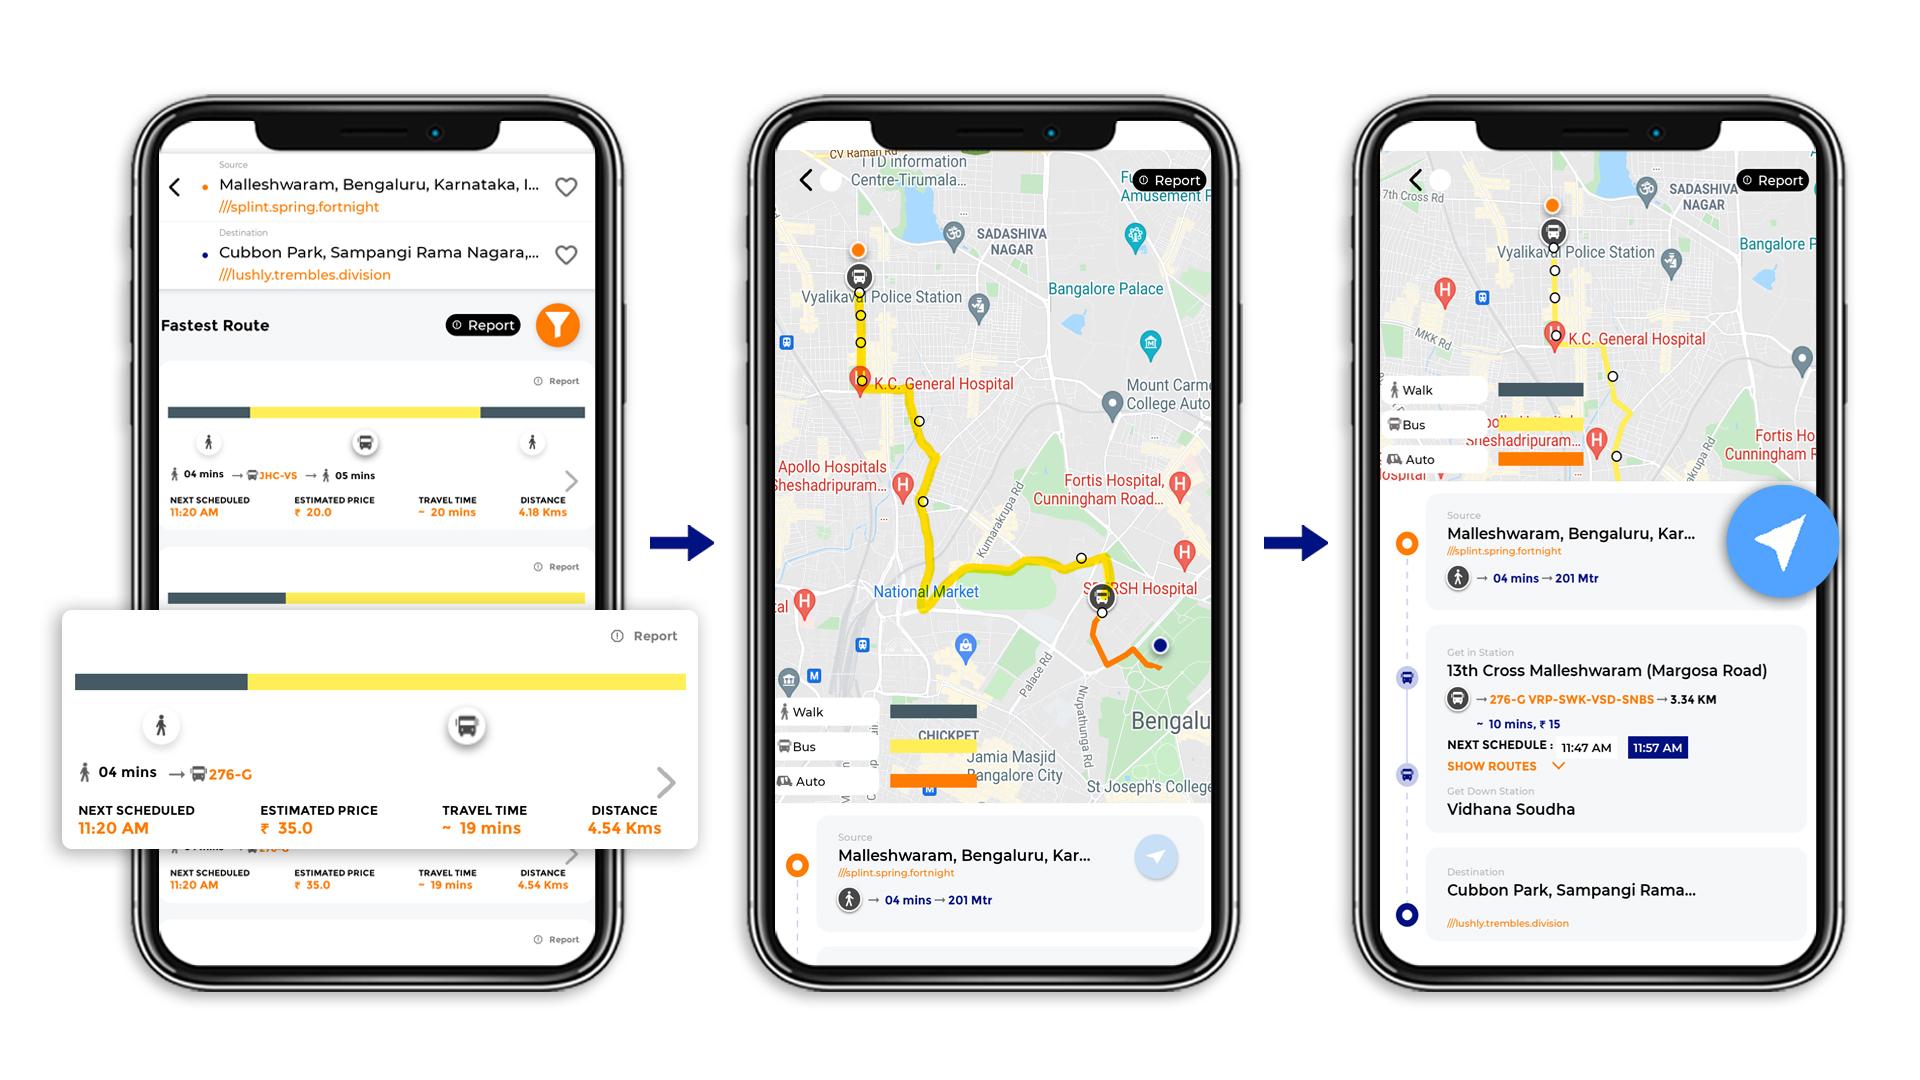 Tummoc, Tummoc app, Public Transport Information, Malleshwaram ,Cubbon Park